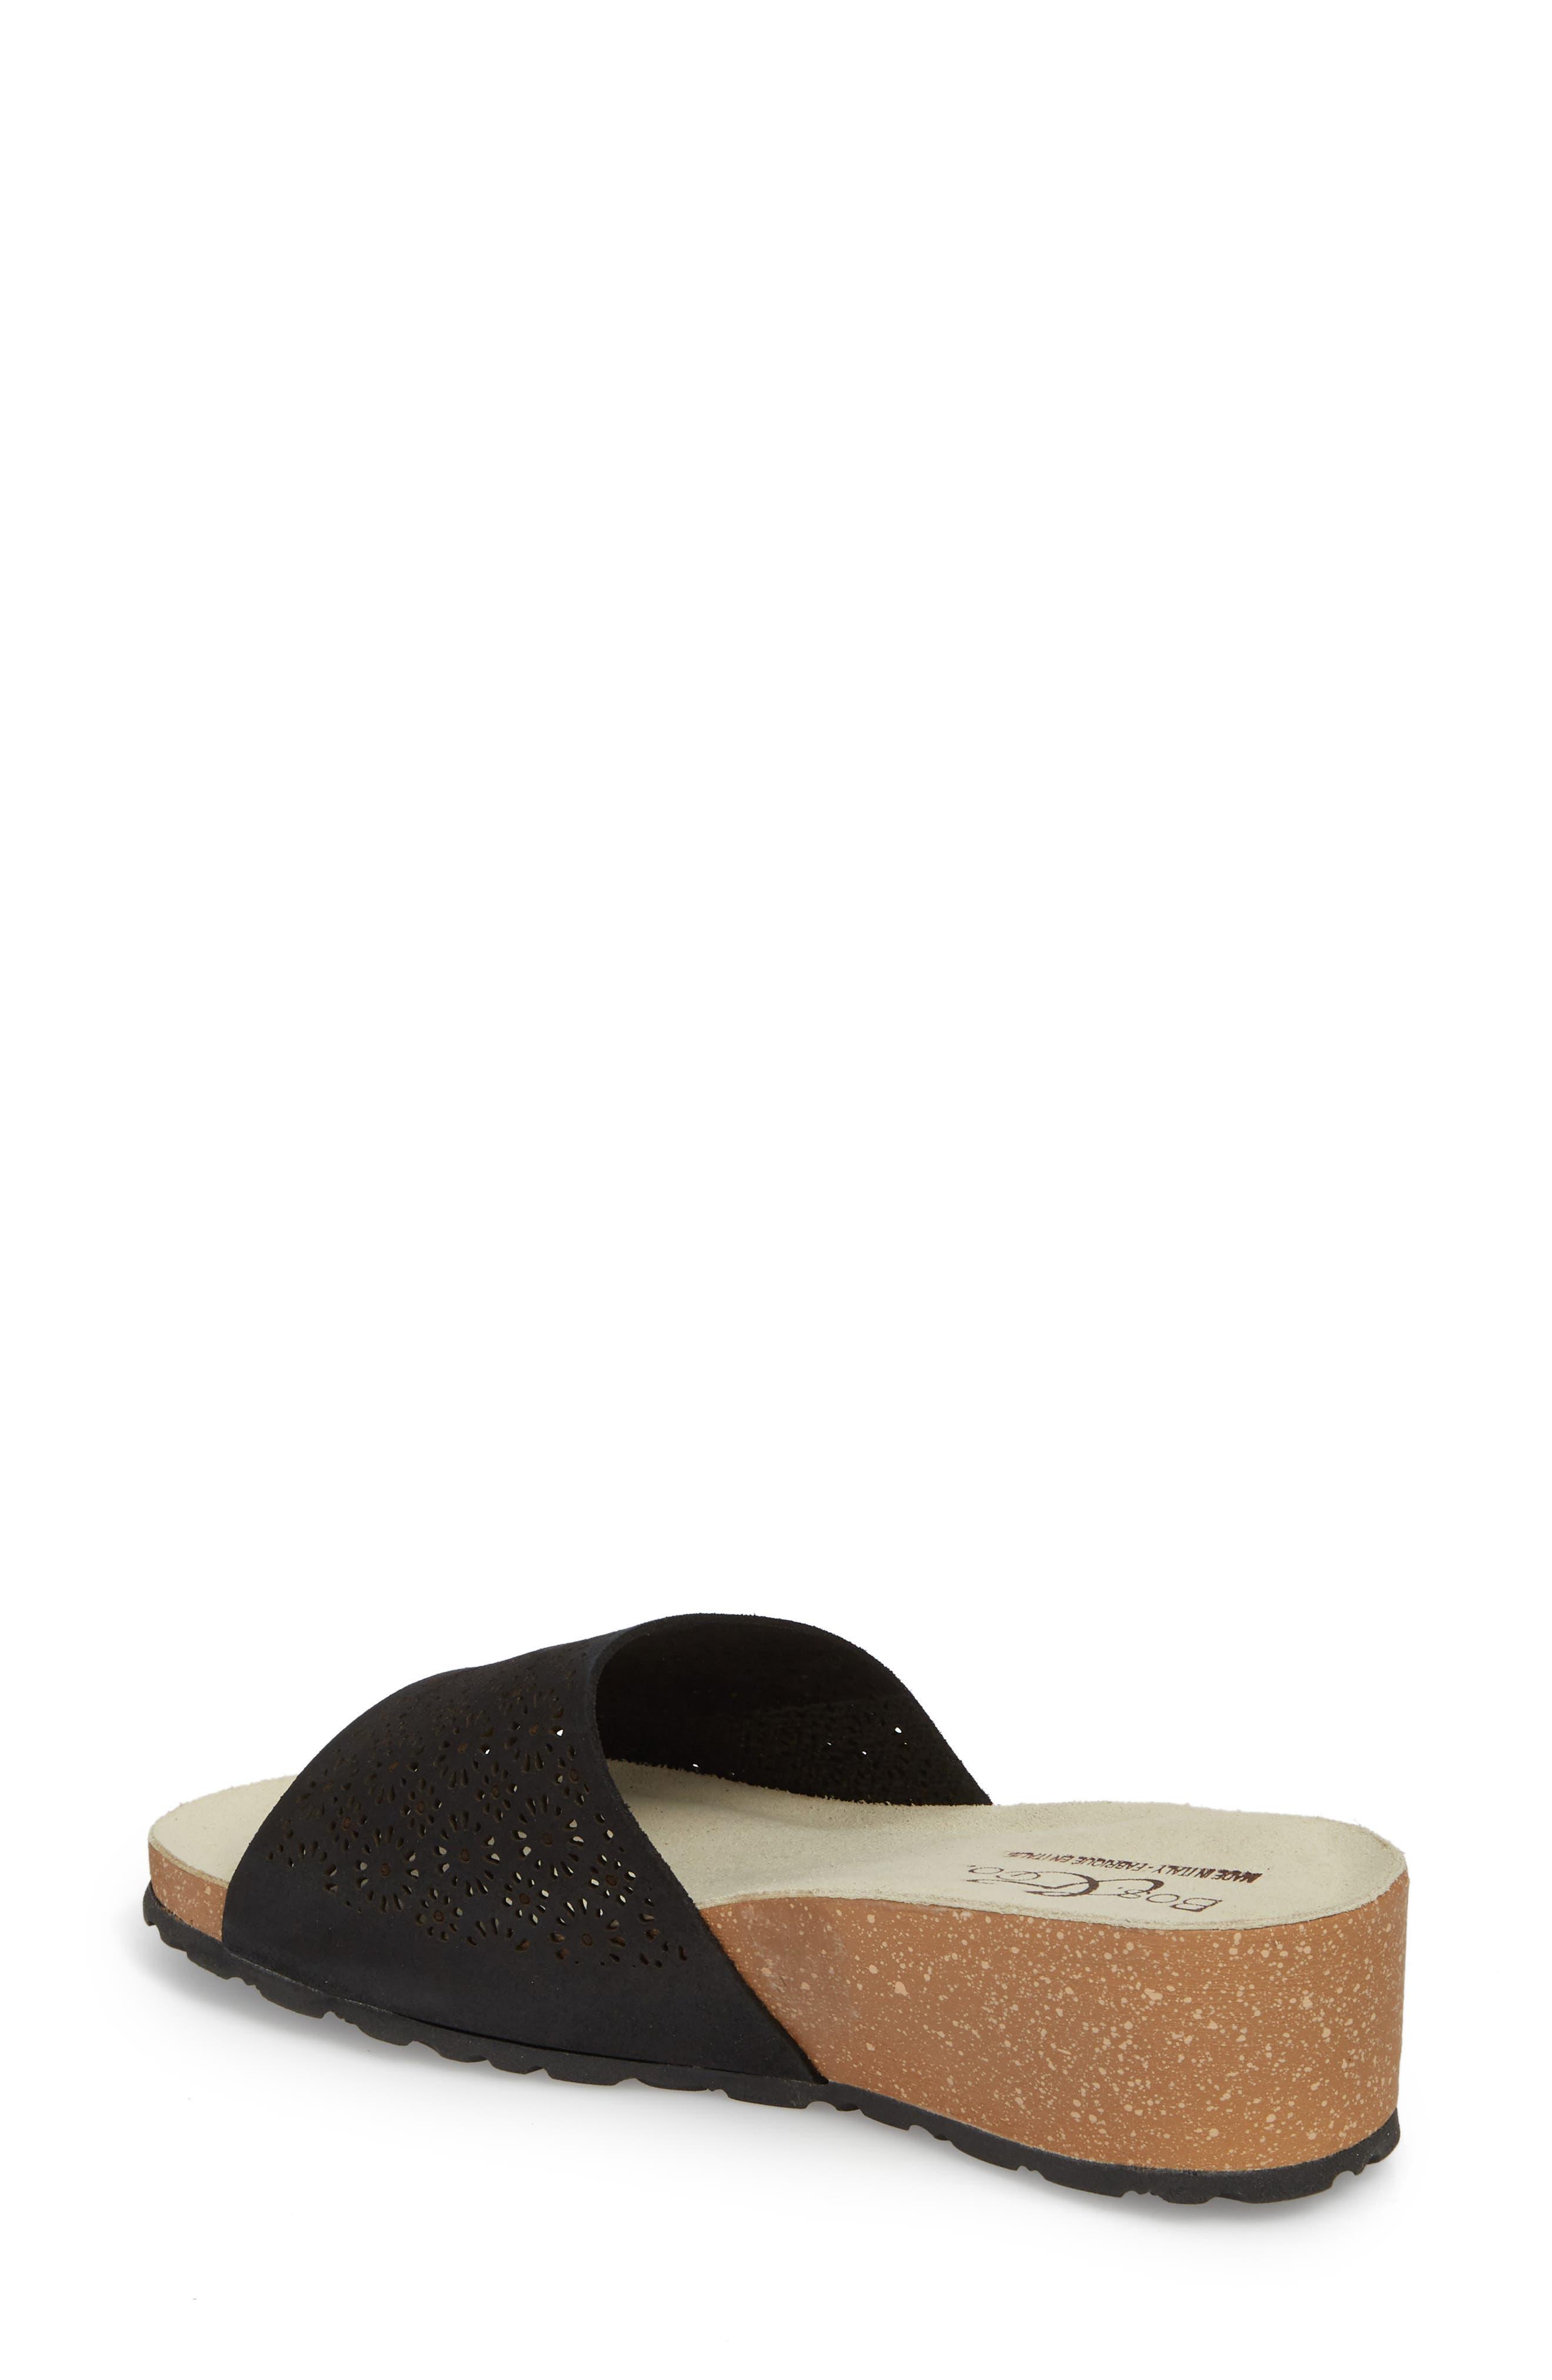 BOS. & CO., Loa Wedge Slide Sandal, Alternate thumbnail 2, color, BLACK SUEDE